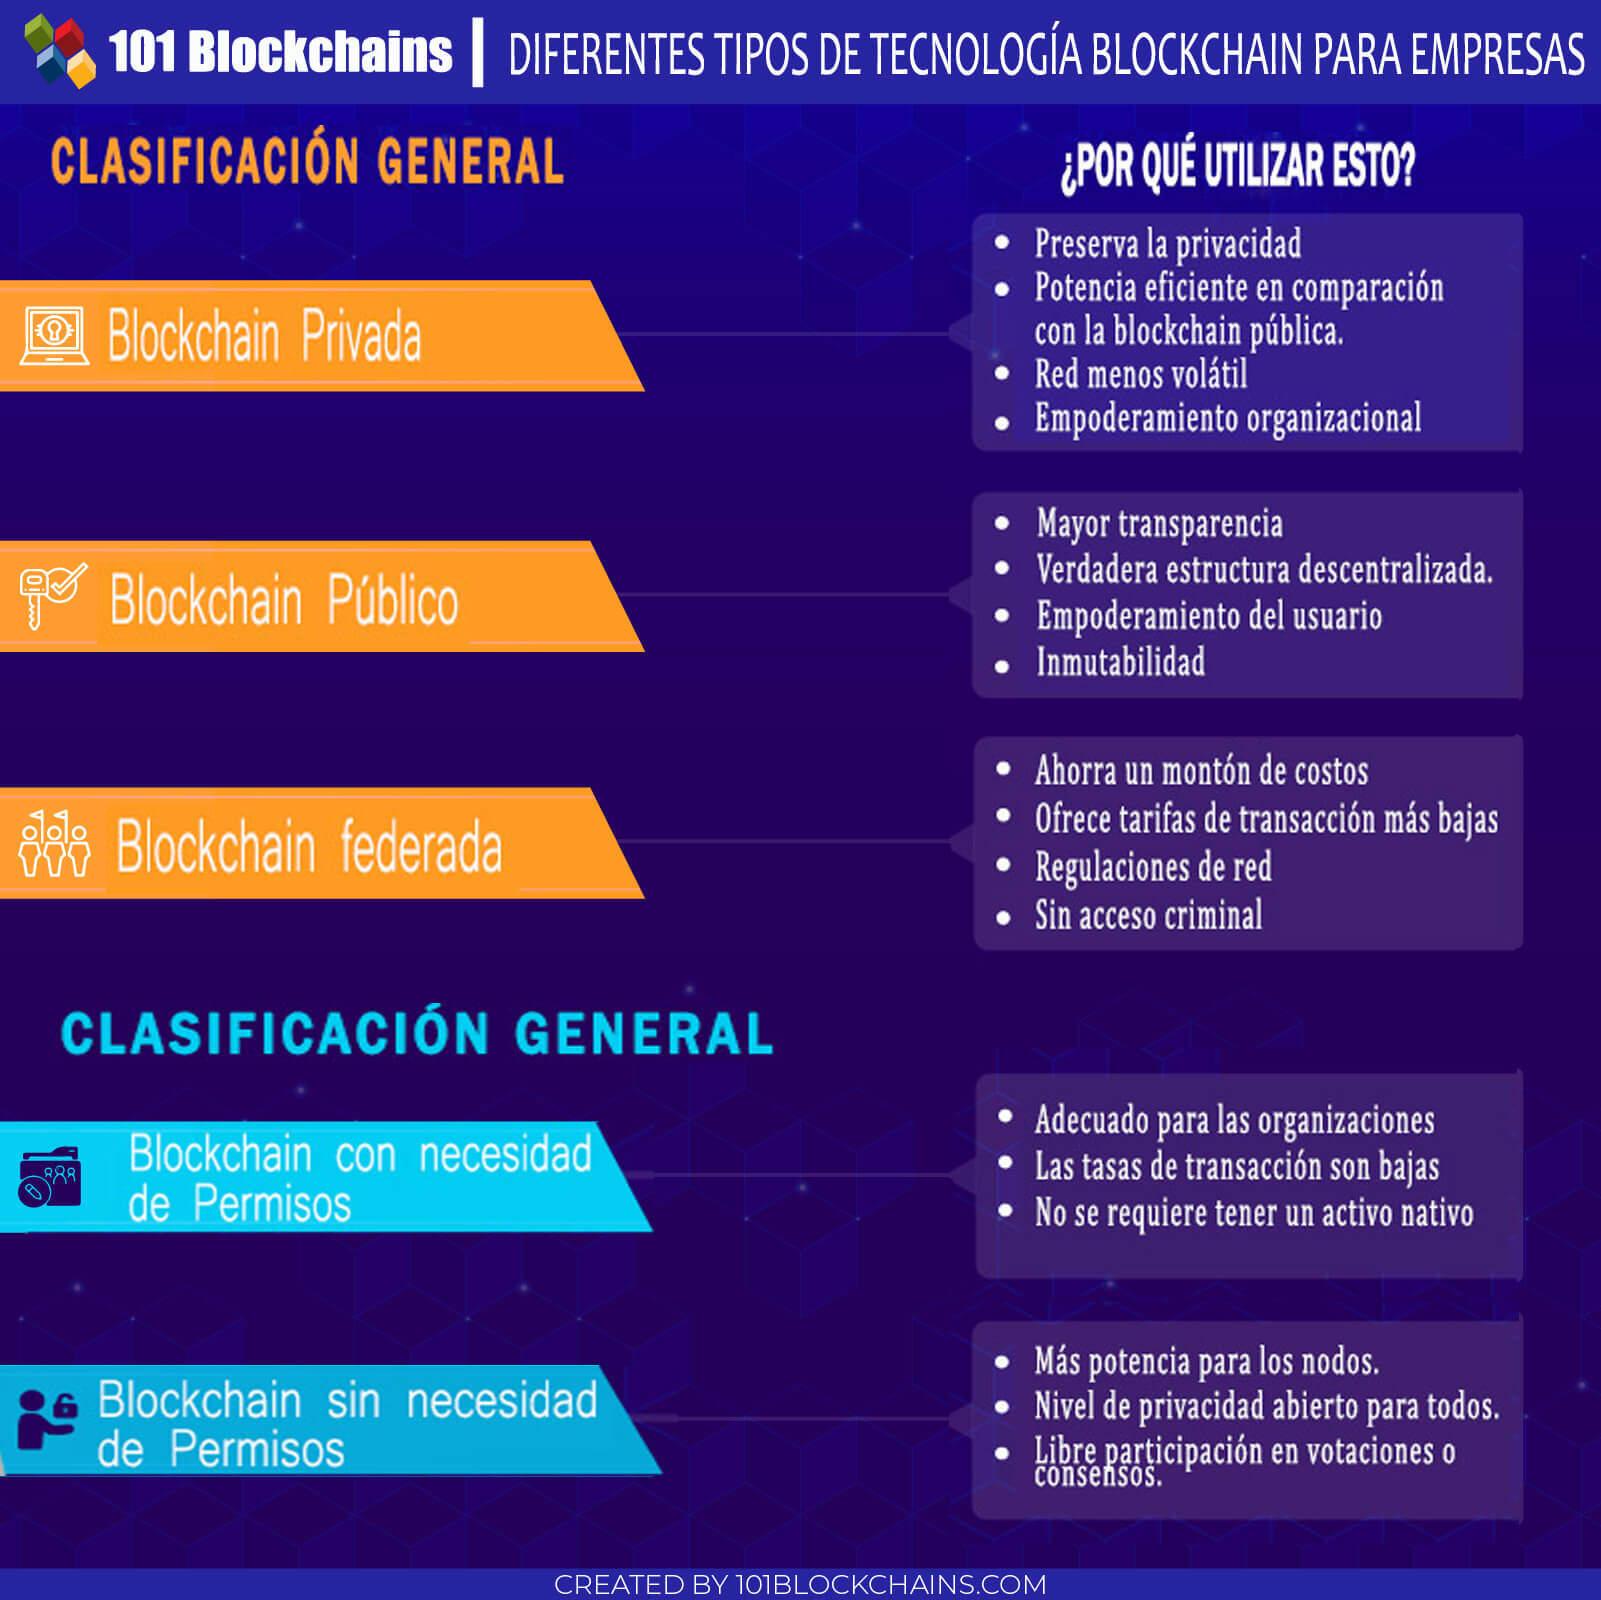 DIFERENTES TIPOS DE TECNOLOGÍA BLOCKCHAIN PARA EMPRESAS